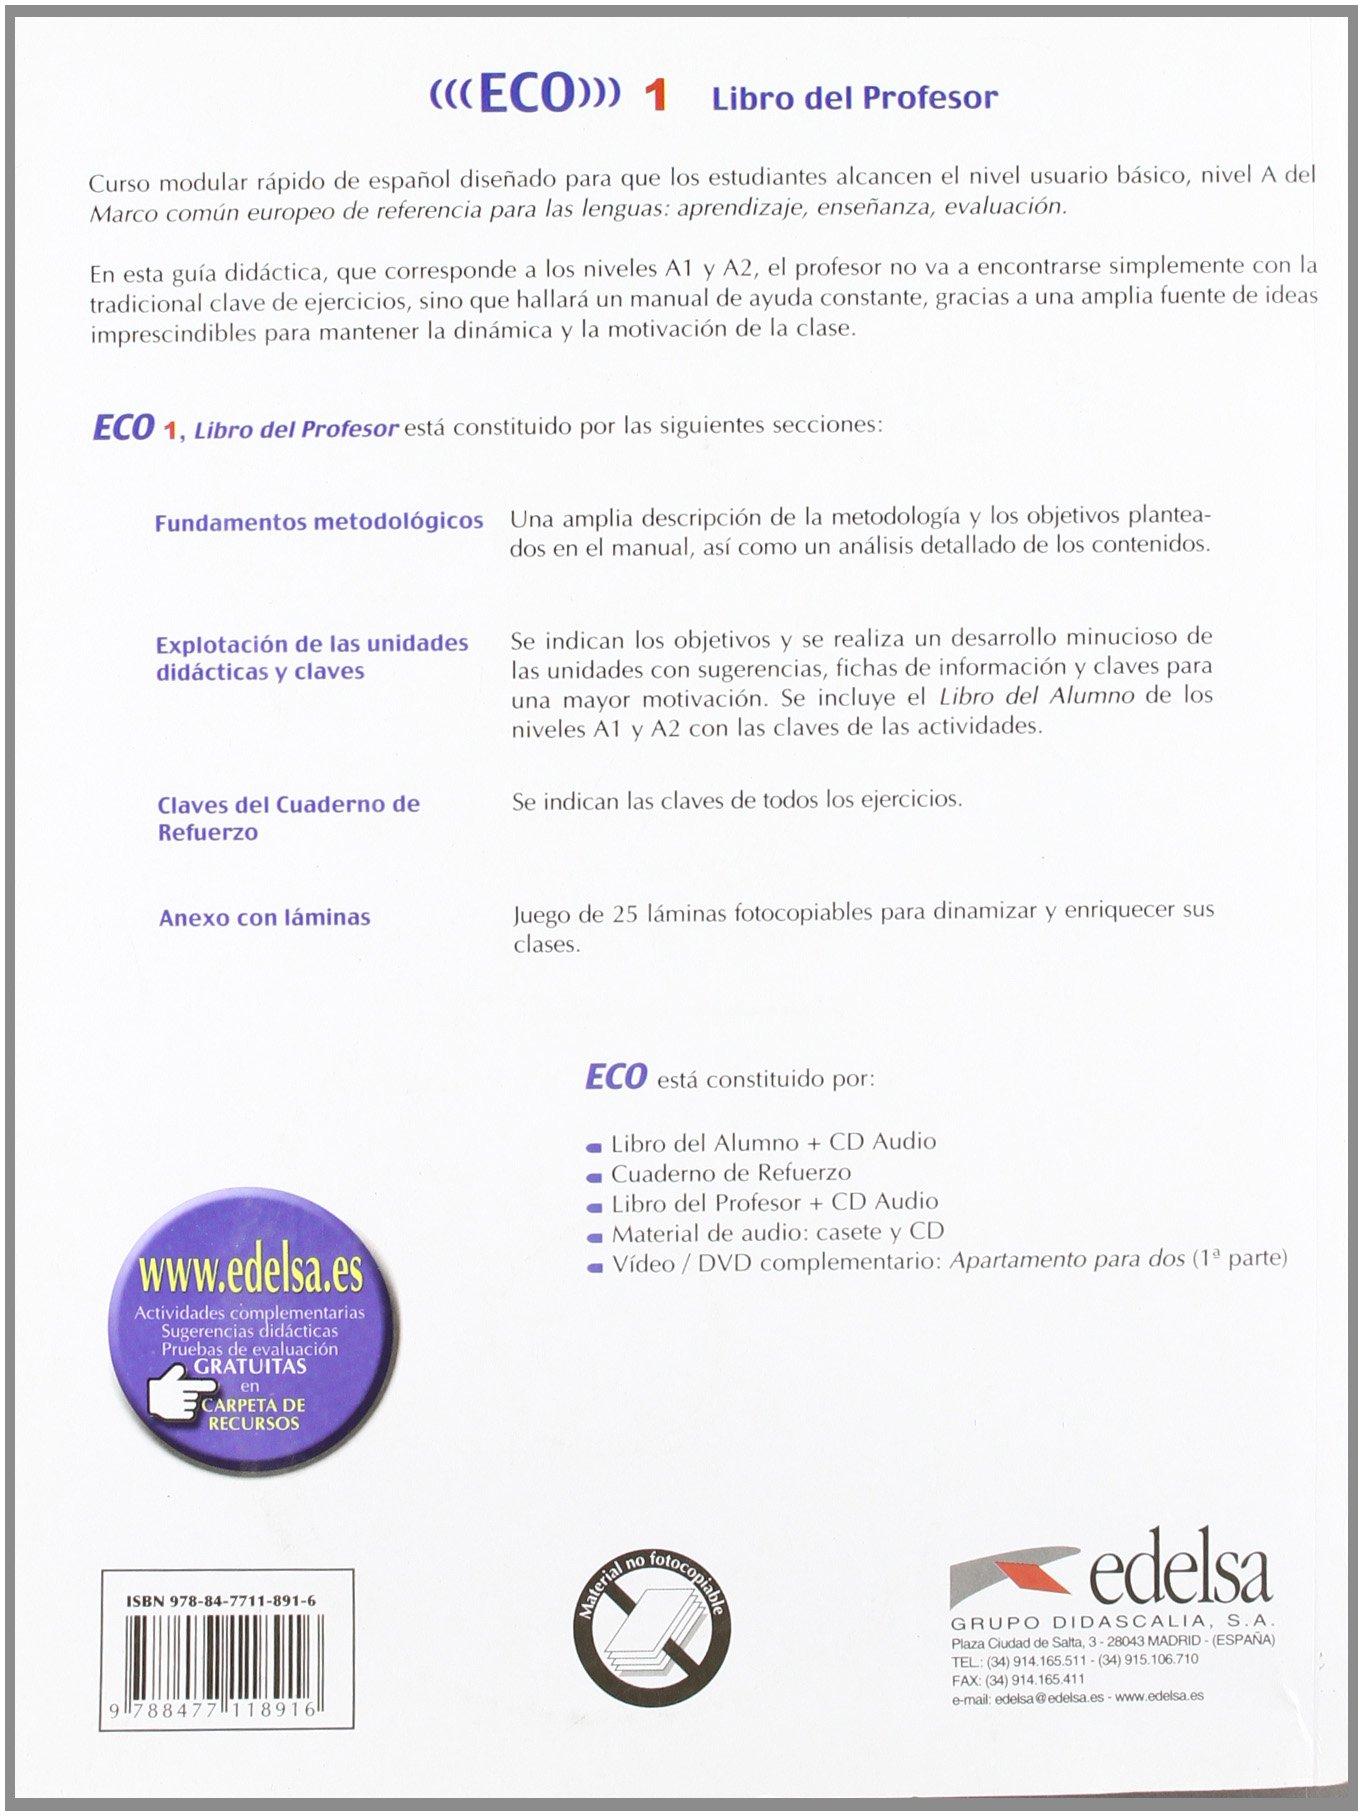 Eco 1 a1 a2 libro del profesor cd audio spanish edition eco 1 a1 a2 libro del profesor cd audio spanish edition a gonzalez c romero 9788477118916 amazon books fandeluxe Images